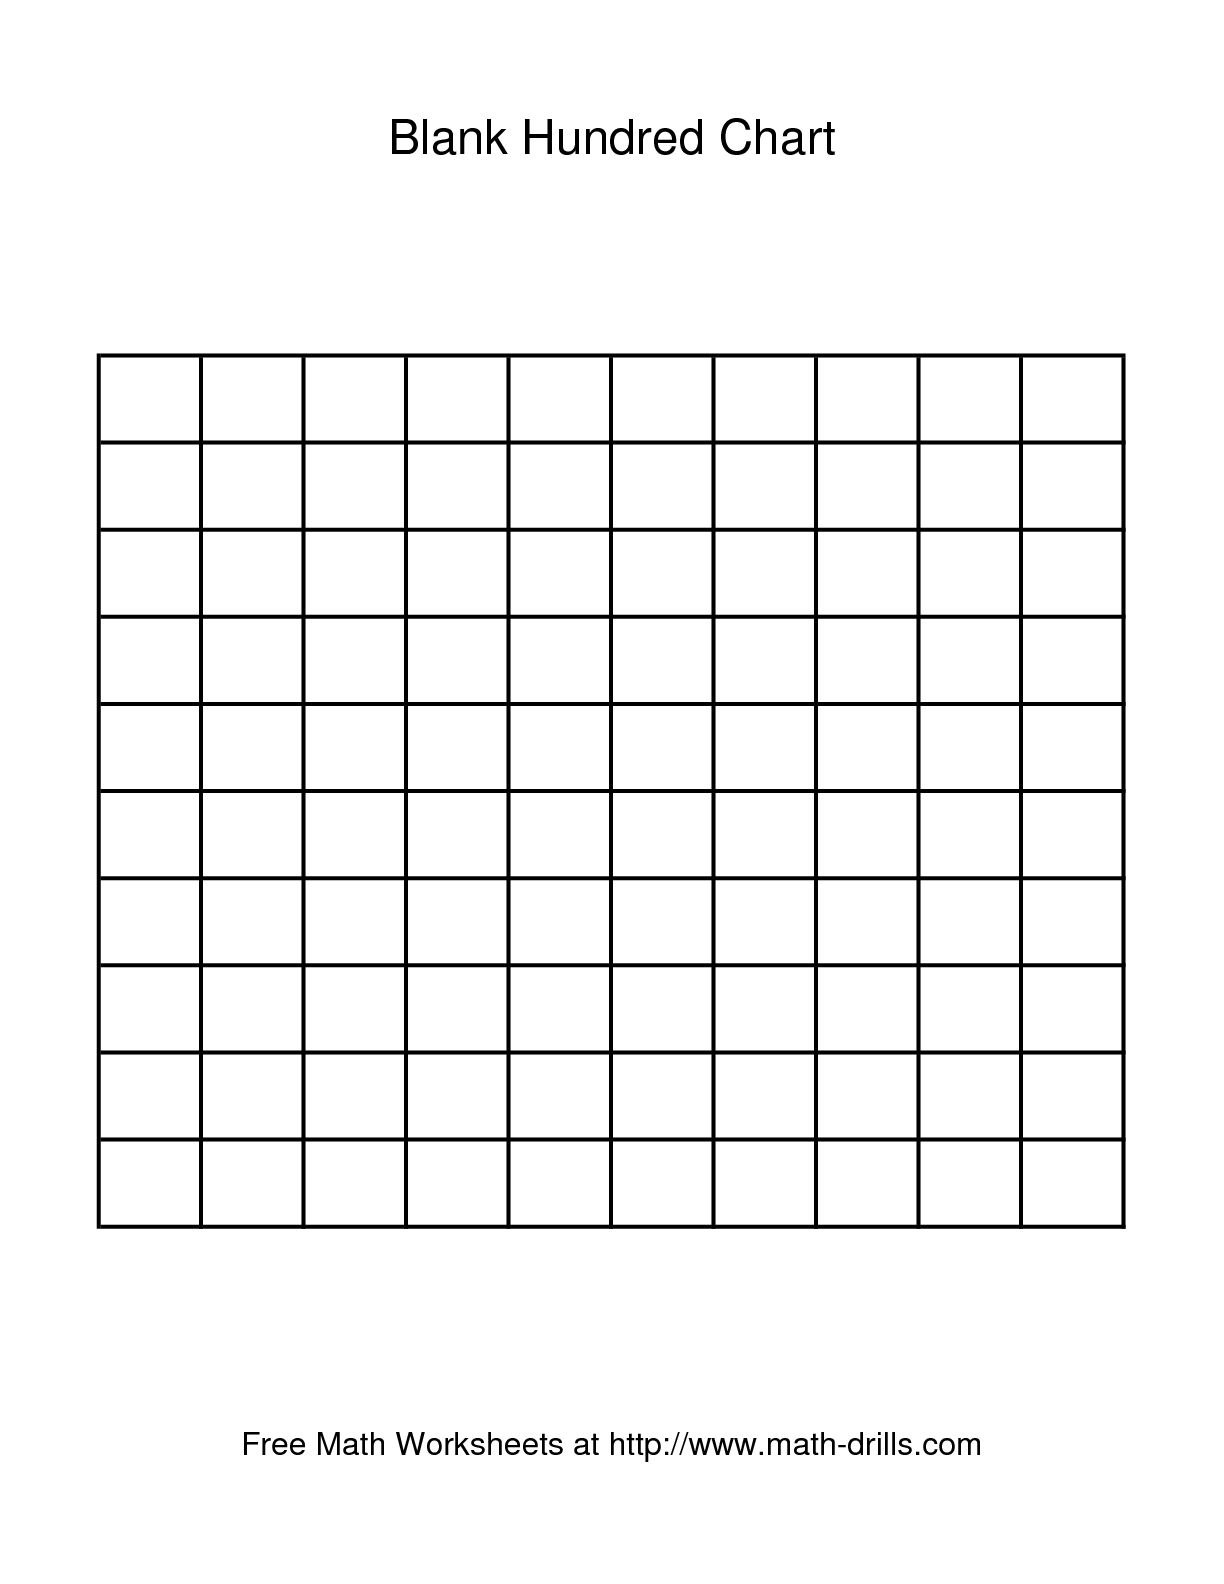 15 Best Images Of Blank Hundreds Chart Worksheet